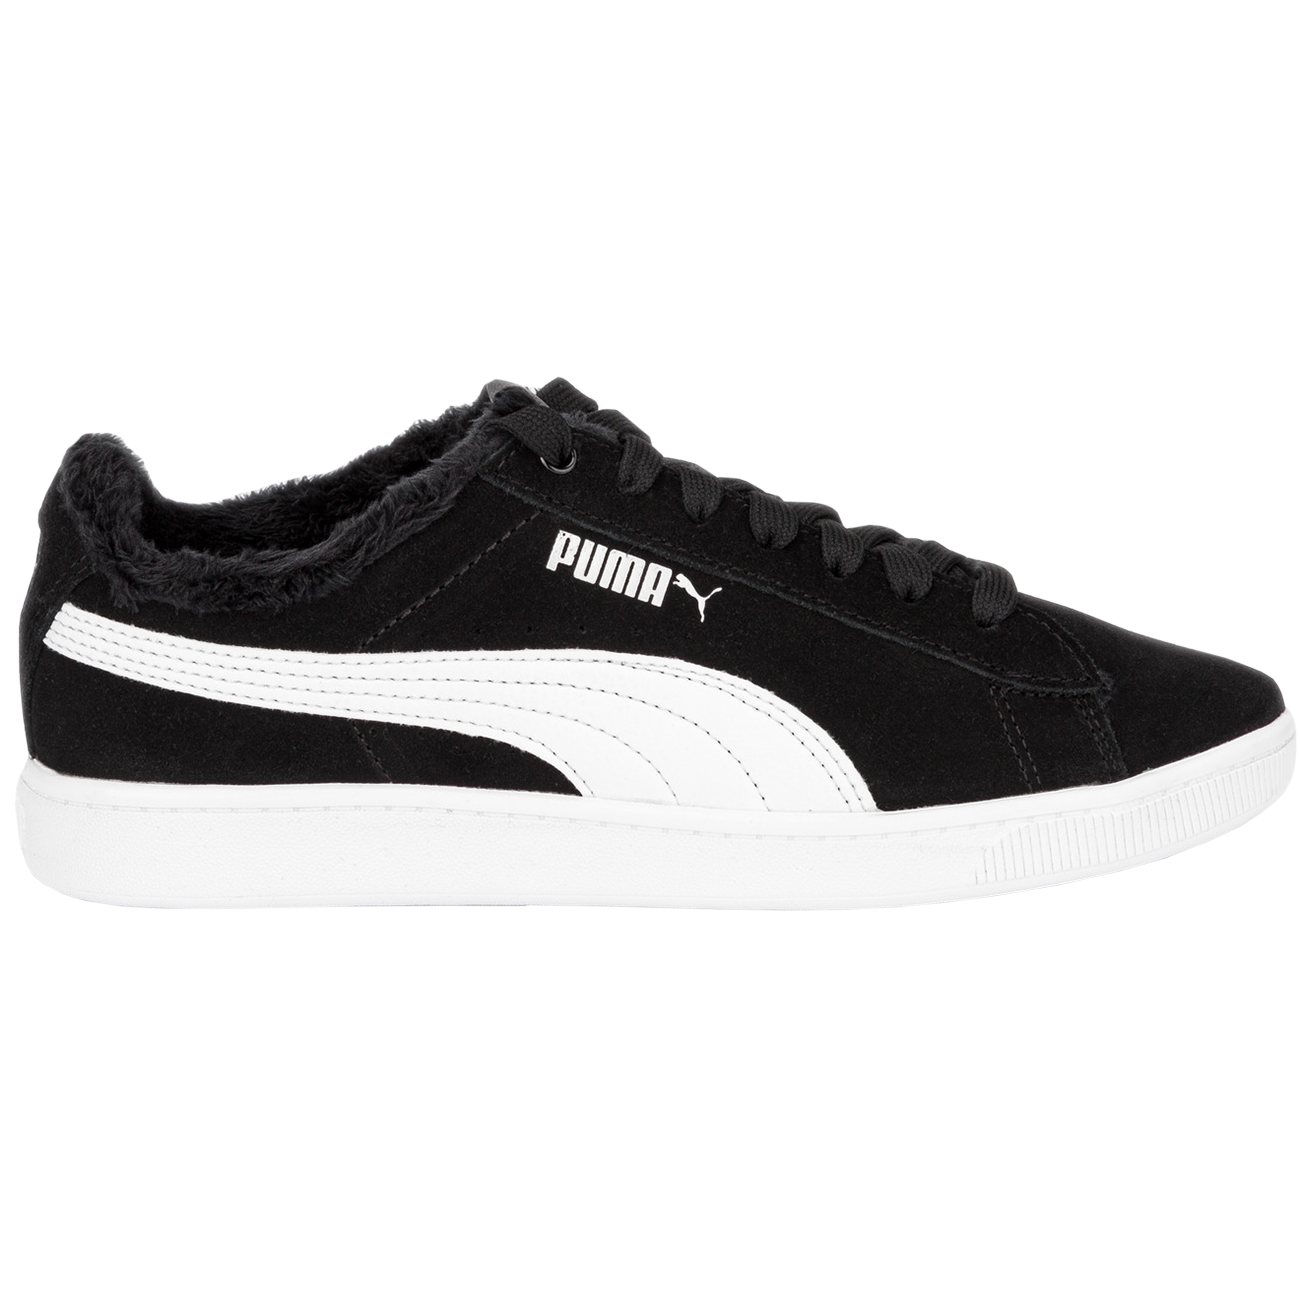 Puma Vikky v2 Fur Damen Sneaker schwarz weiß